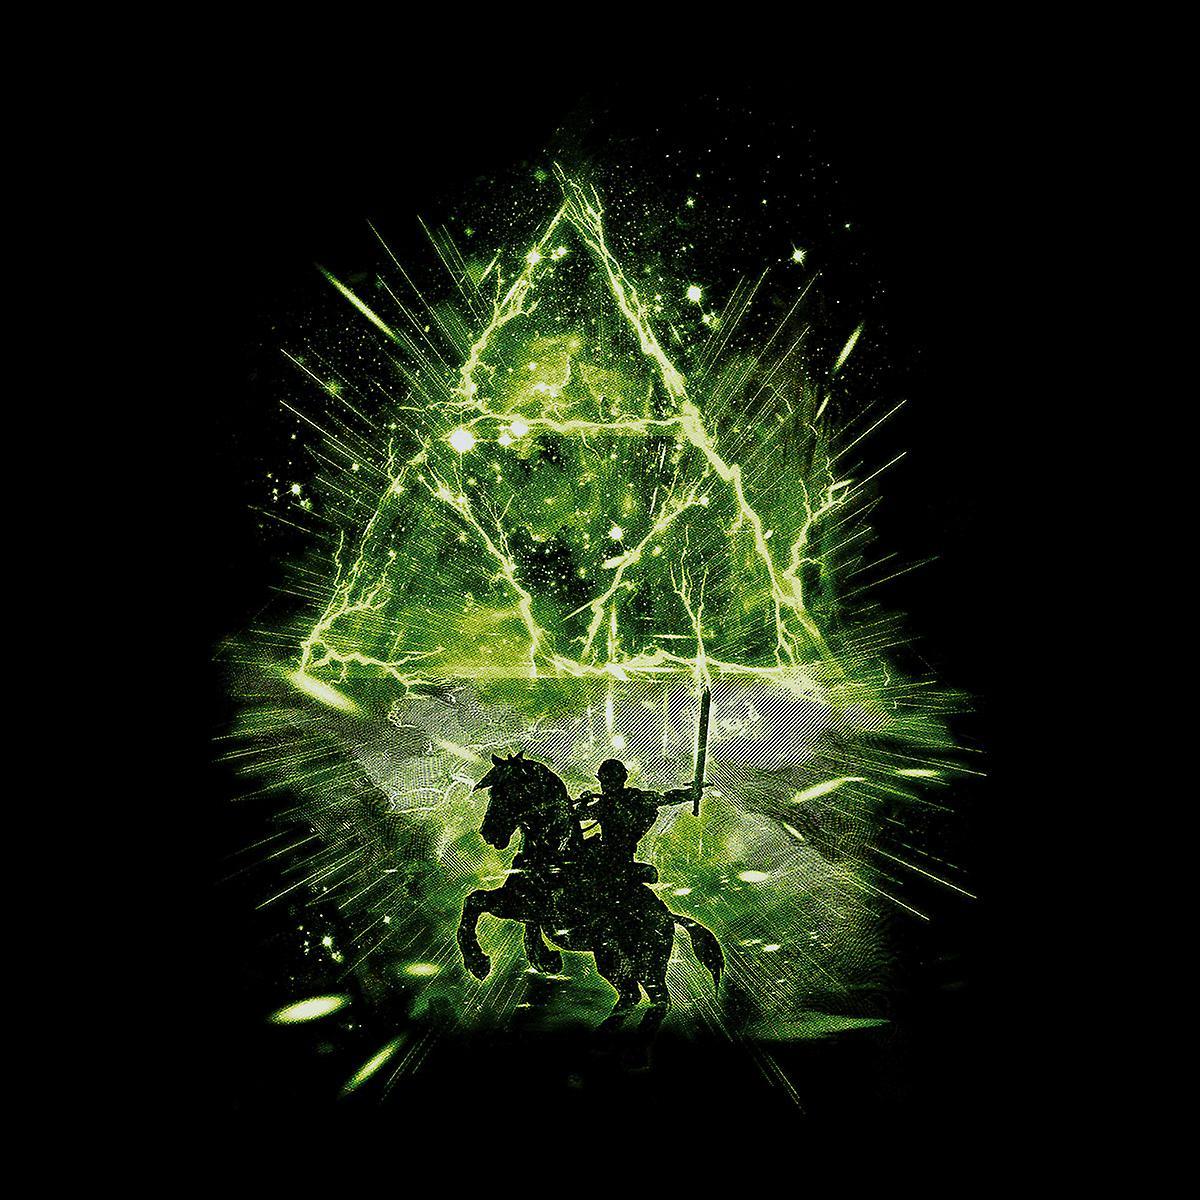 Triforce Storm Legend of Zelda mäns väst